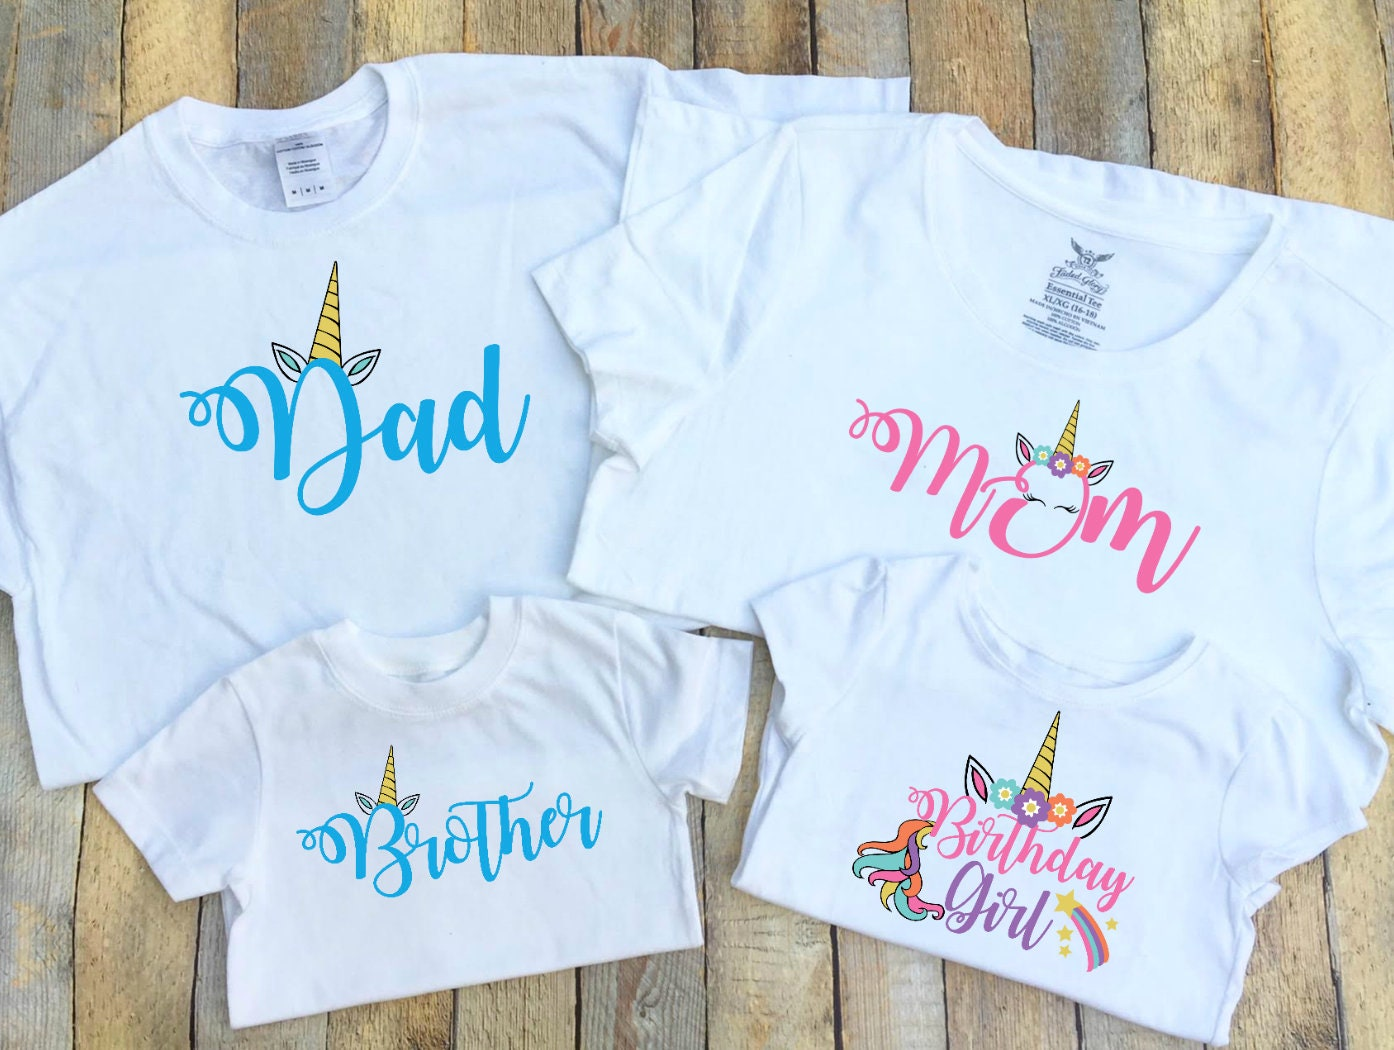 Dad Mom Brother Birthday Girl Unicorn Family T Shirts   Etsy